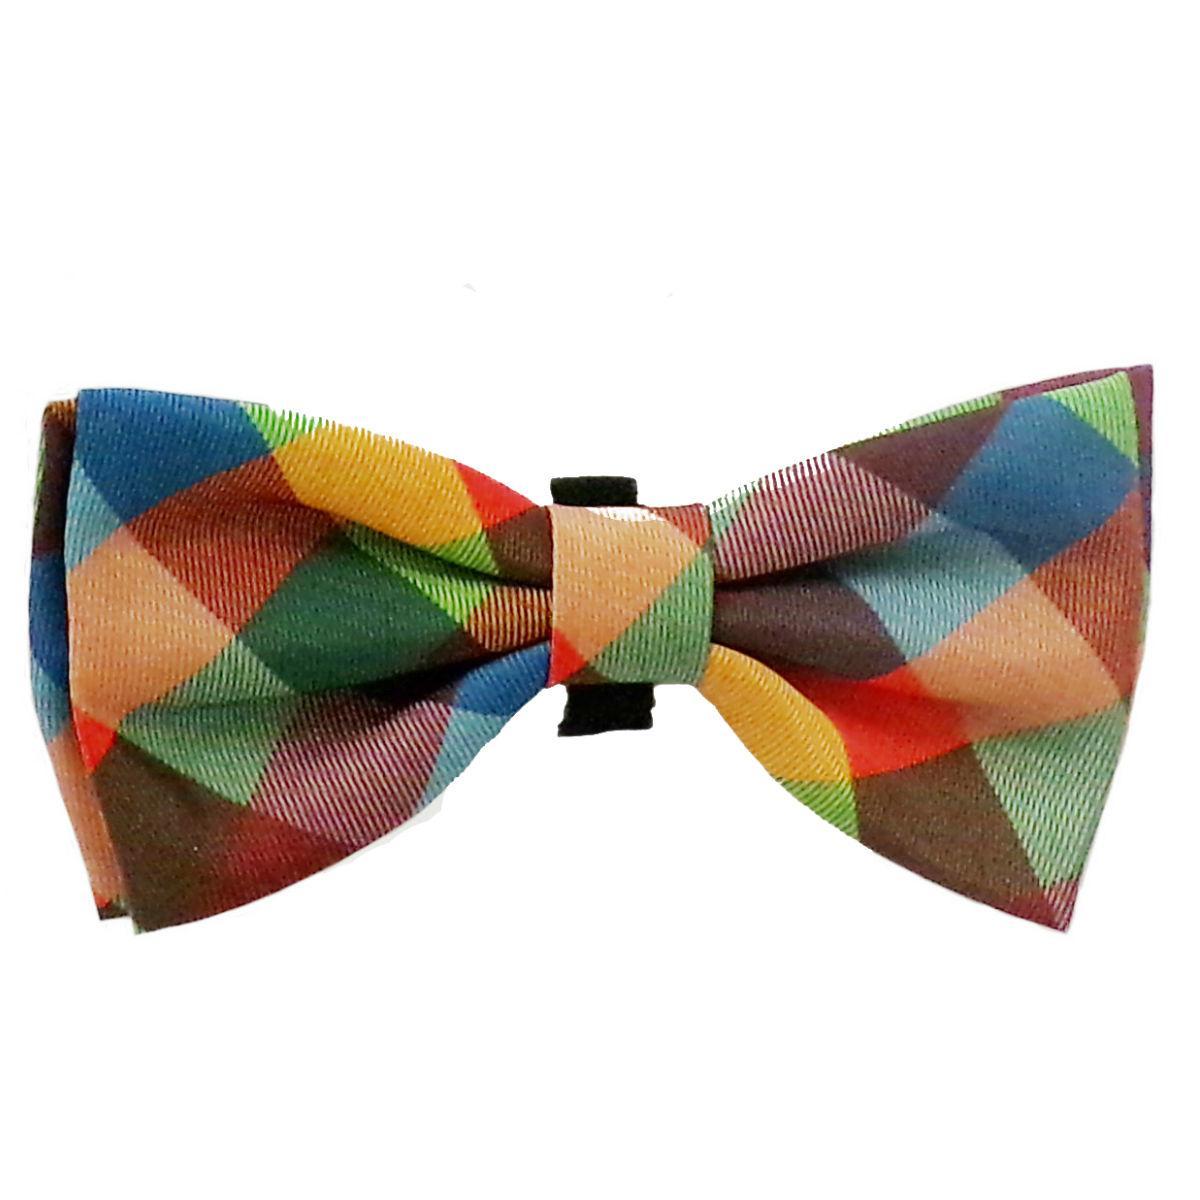 Huxley & Kent Pet Bow Tie Collar Attachment - Fall Check